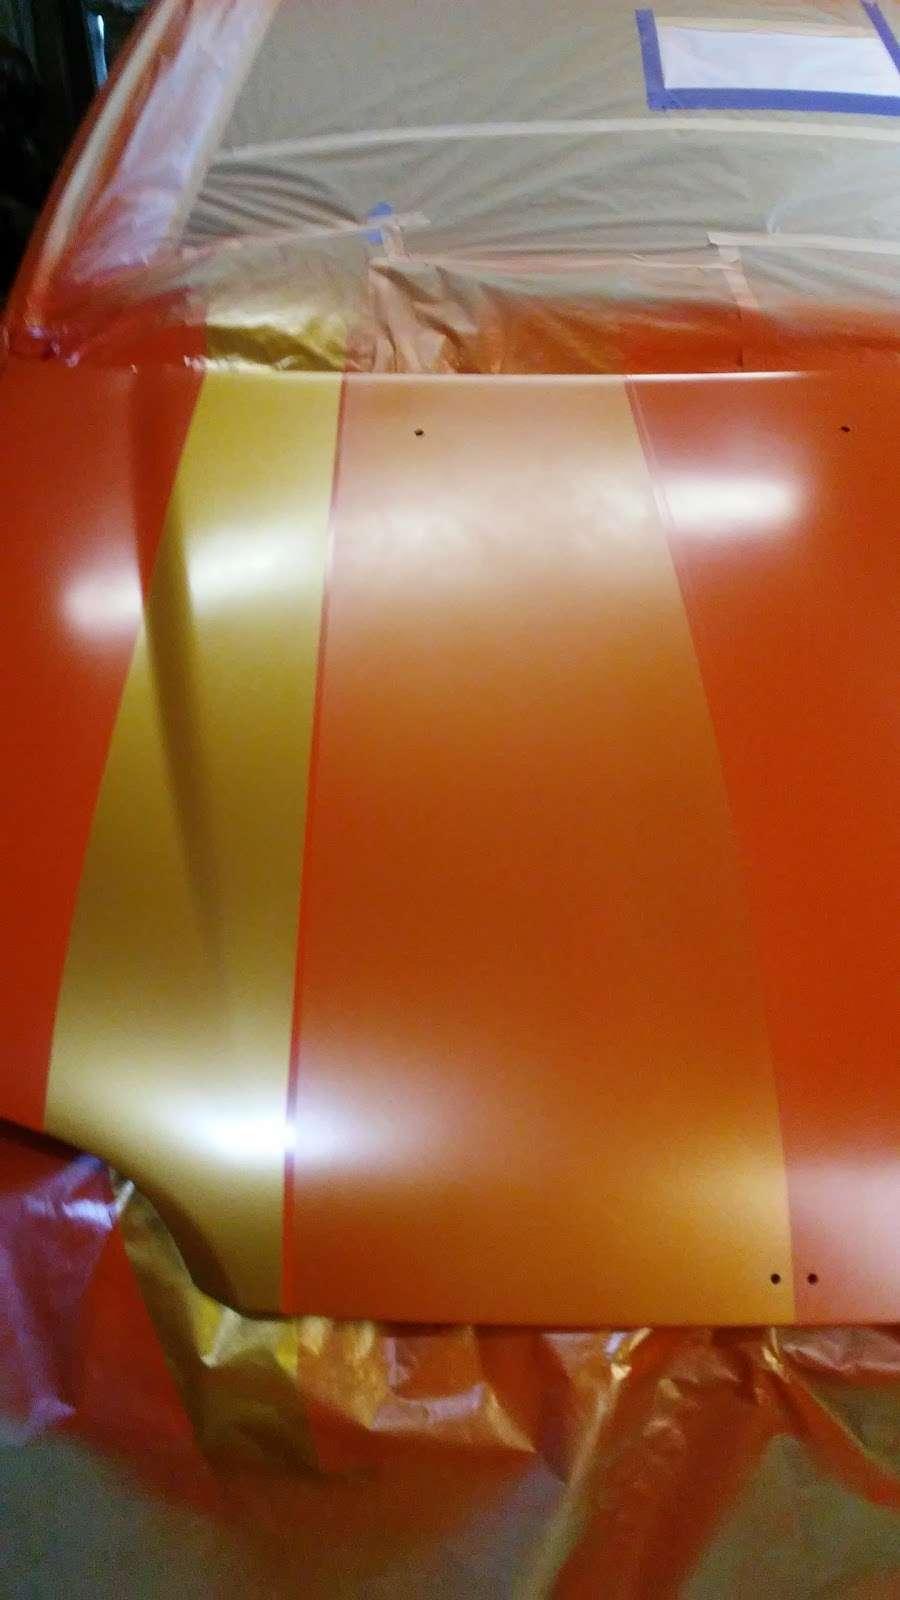 Merlin Automotive - car repair  | Photo 8 of 10 | Address: 216 FM78, Schertz, TX 78154, USA | Phone: (210) 945-8993